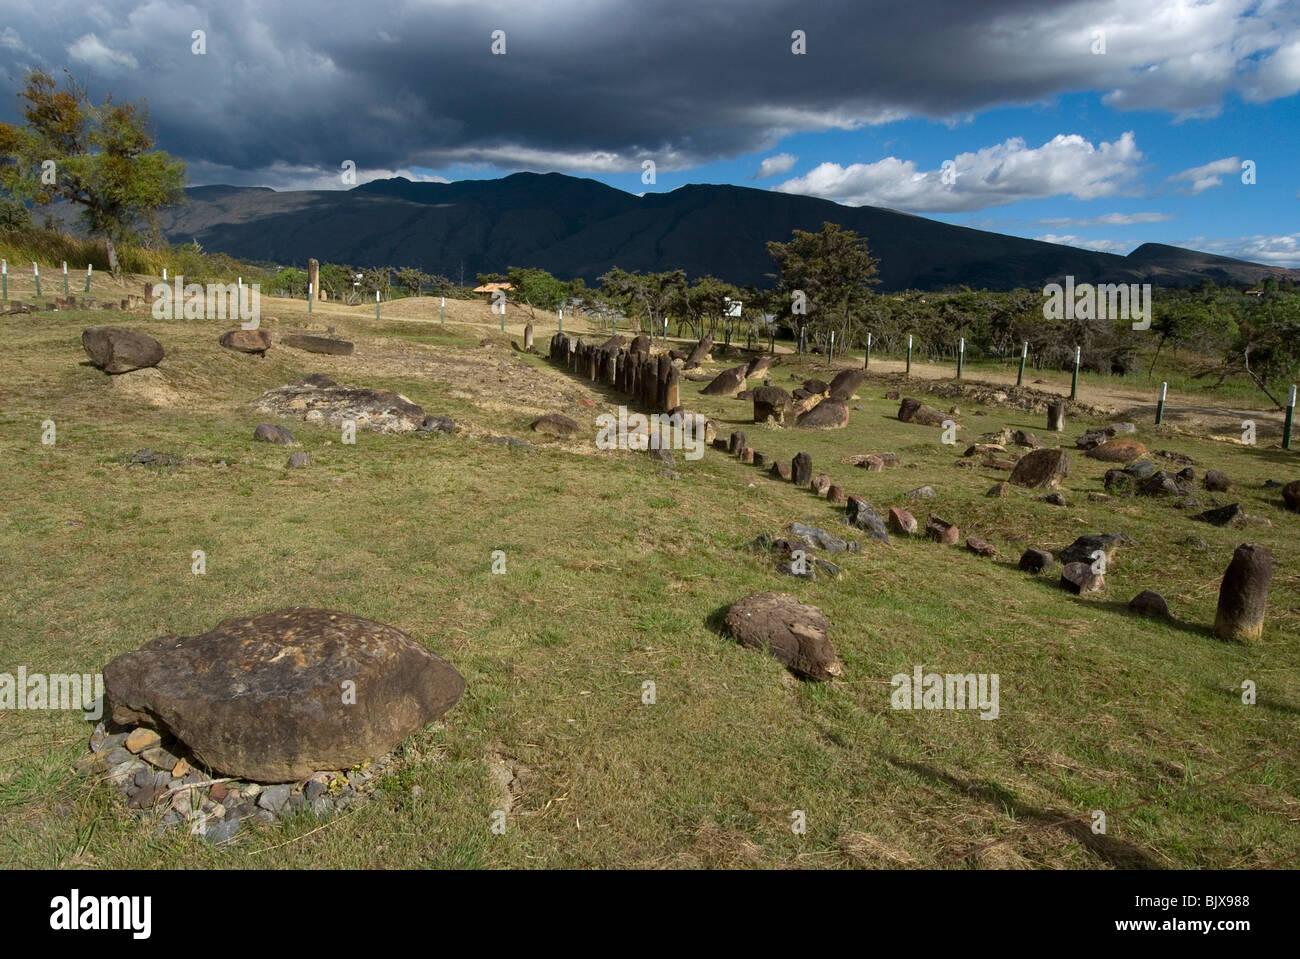 El Infiernito, observatory of the pre-Colombian Muisca civilisation,  near Villa de Leyva, Colombia. - Stock Image